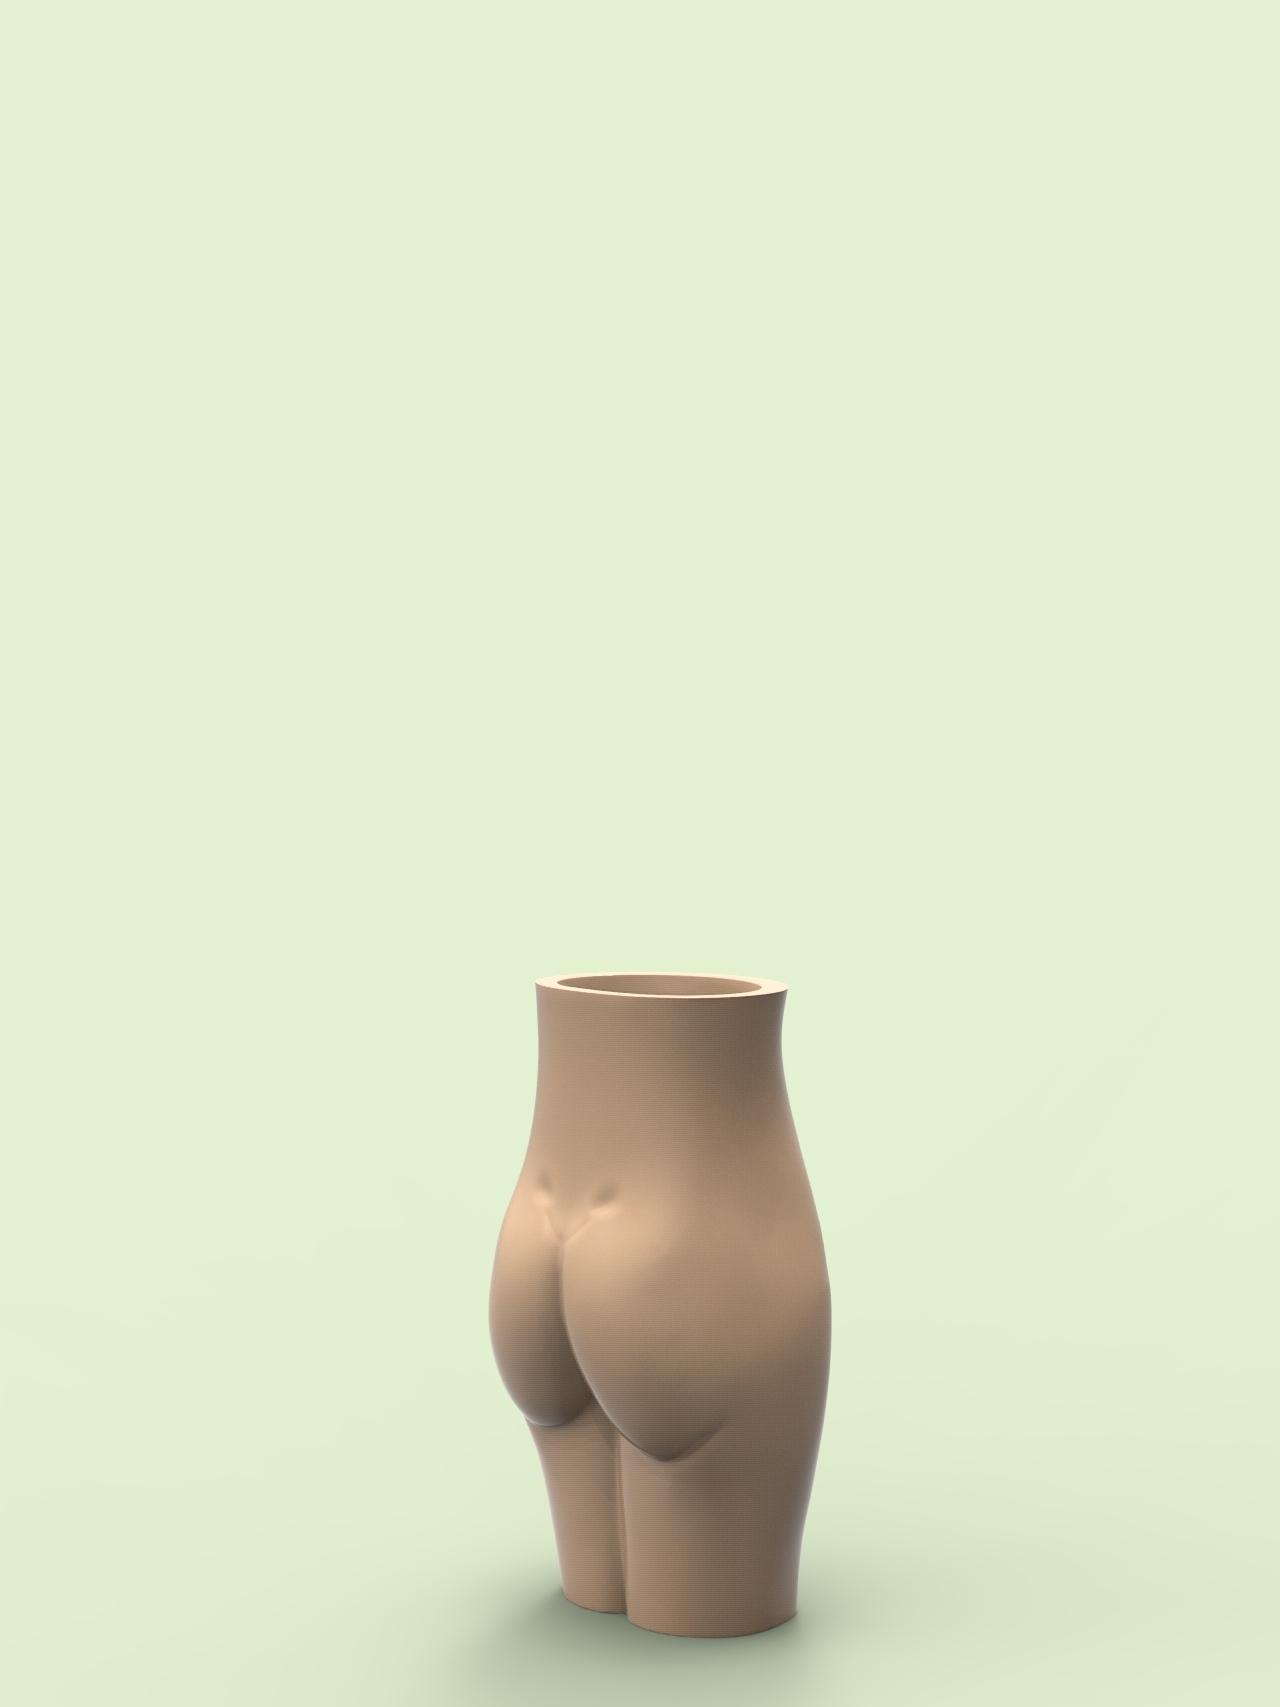 untitled.64.jpg Download free OBJ file Female vase • Design to 3D print, h3ydari96